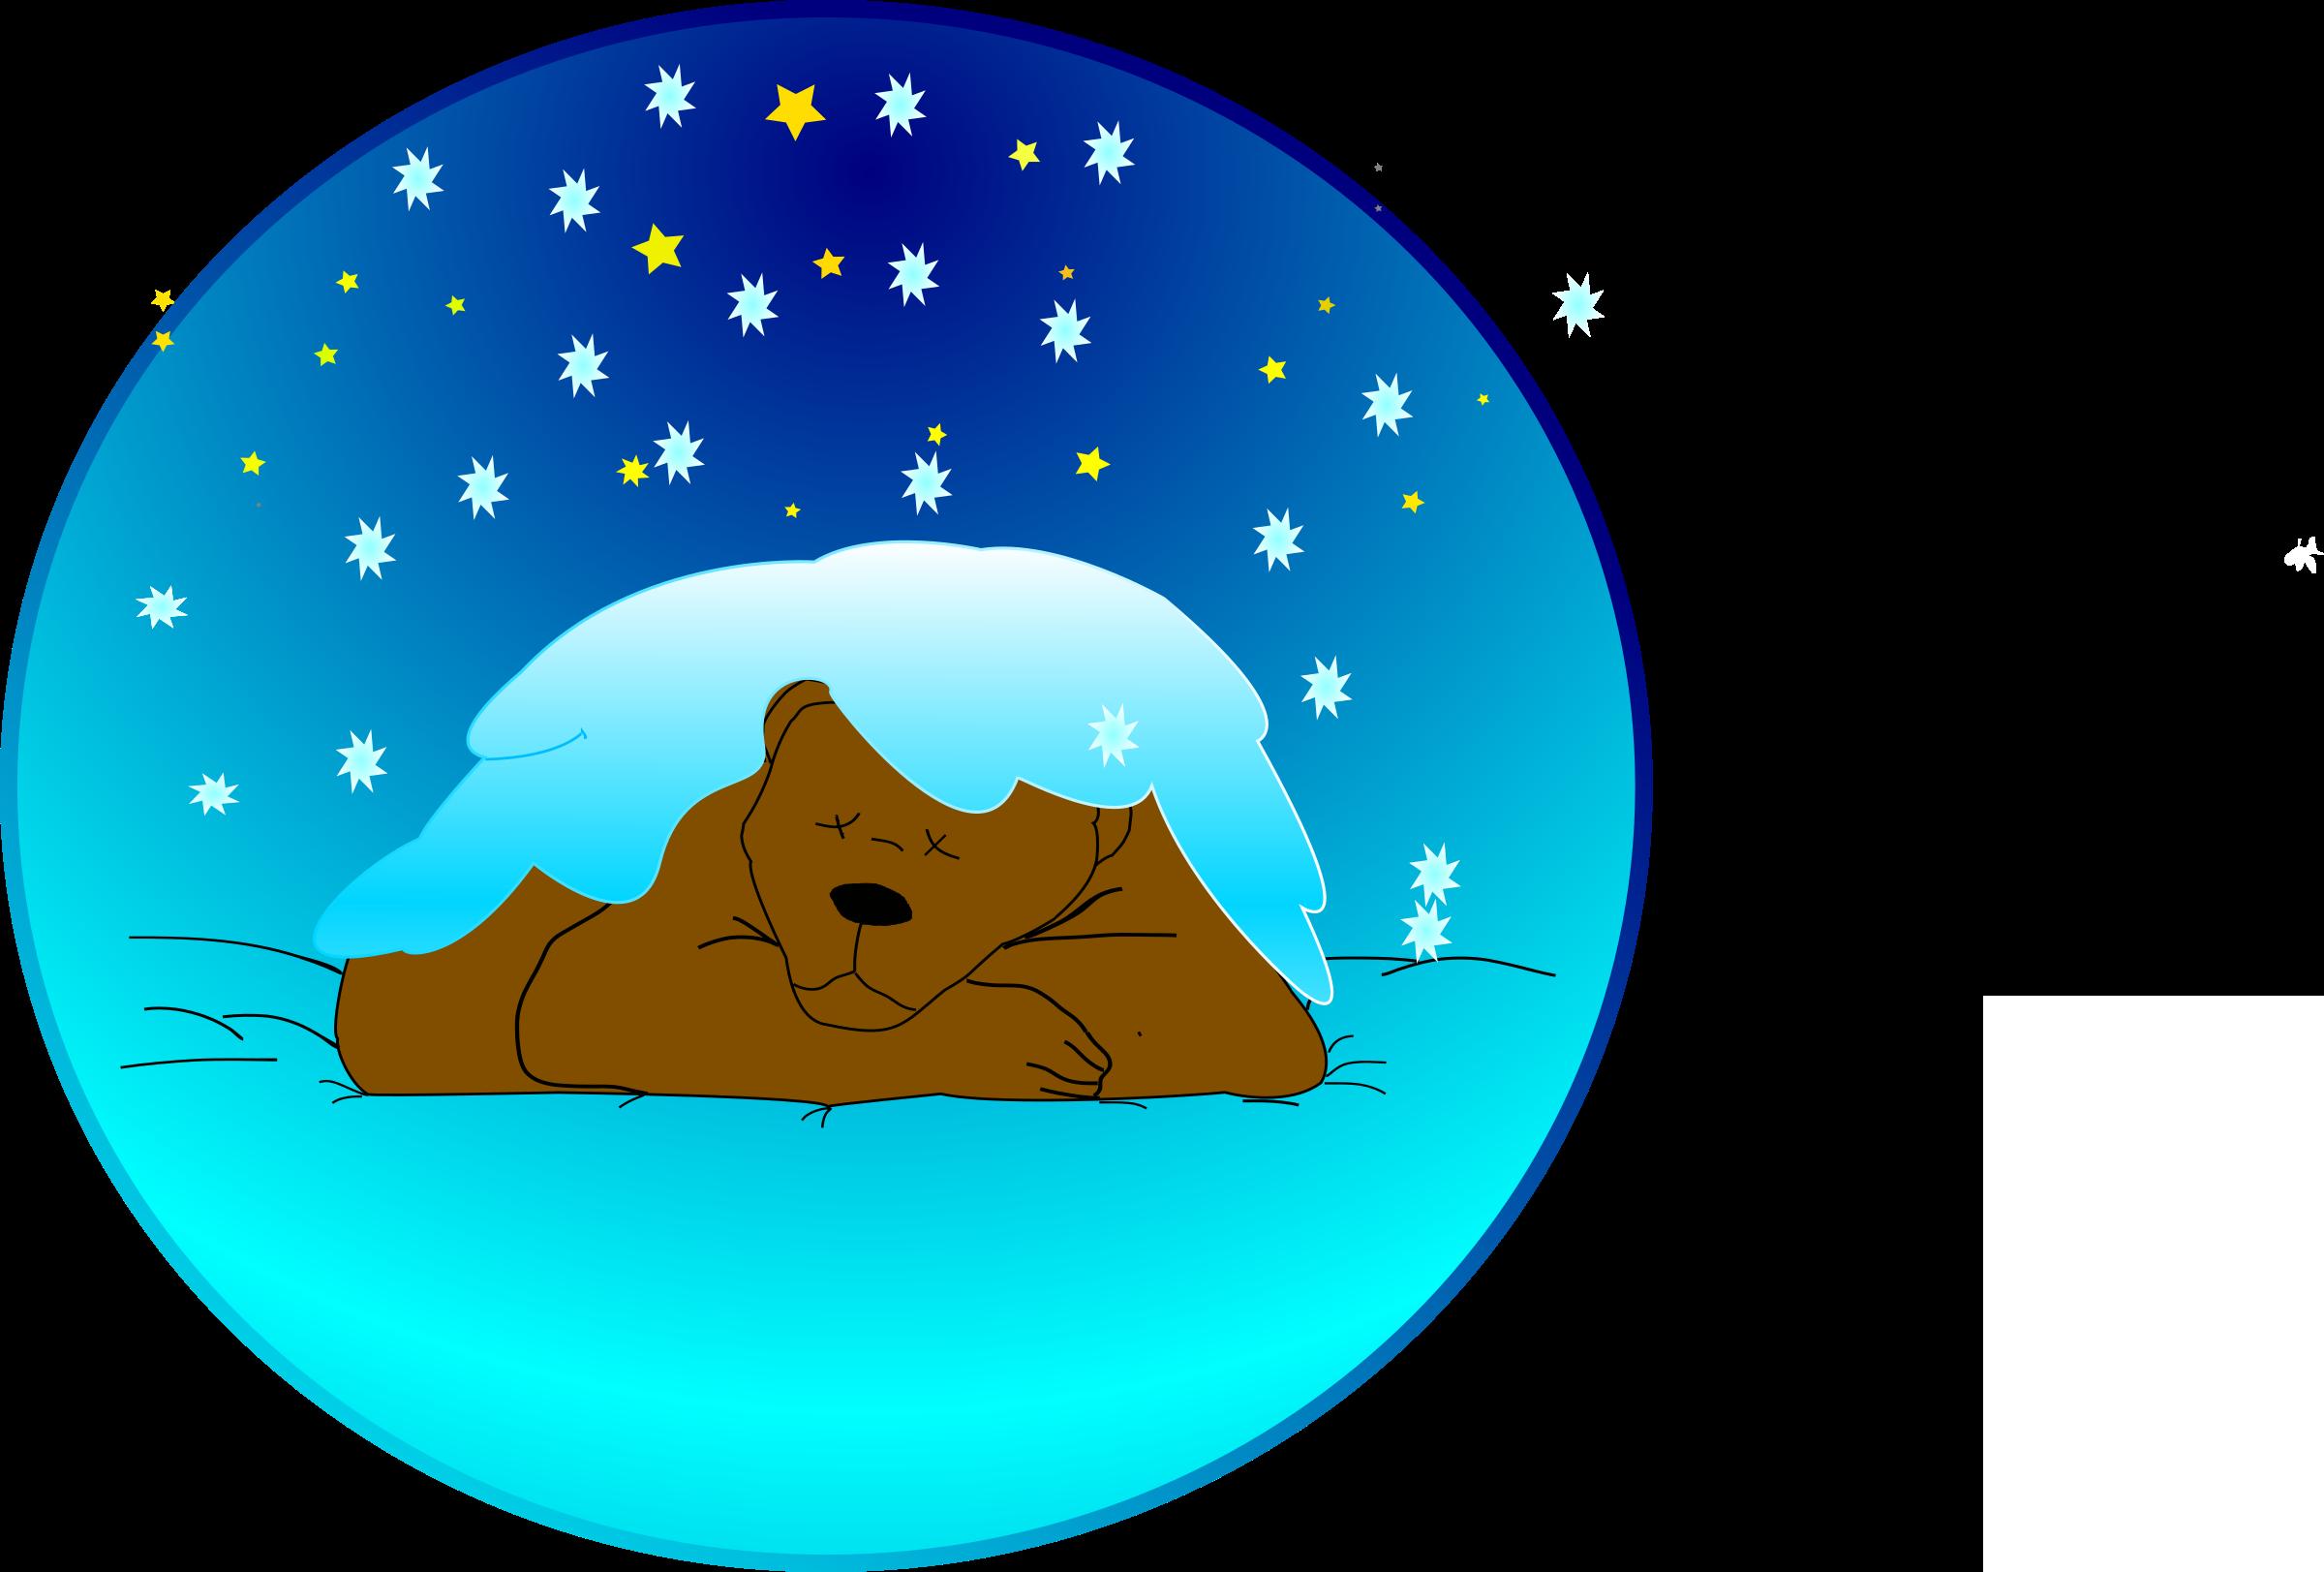 bear sleeping under the snow vector clipart image free stock photo rh goodfreephotos com snow vector free snow vector animation